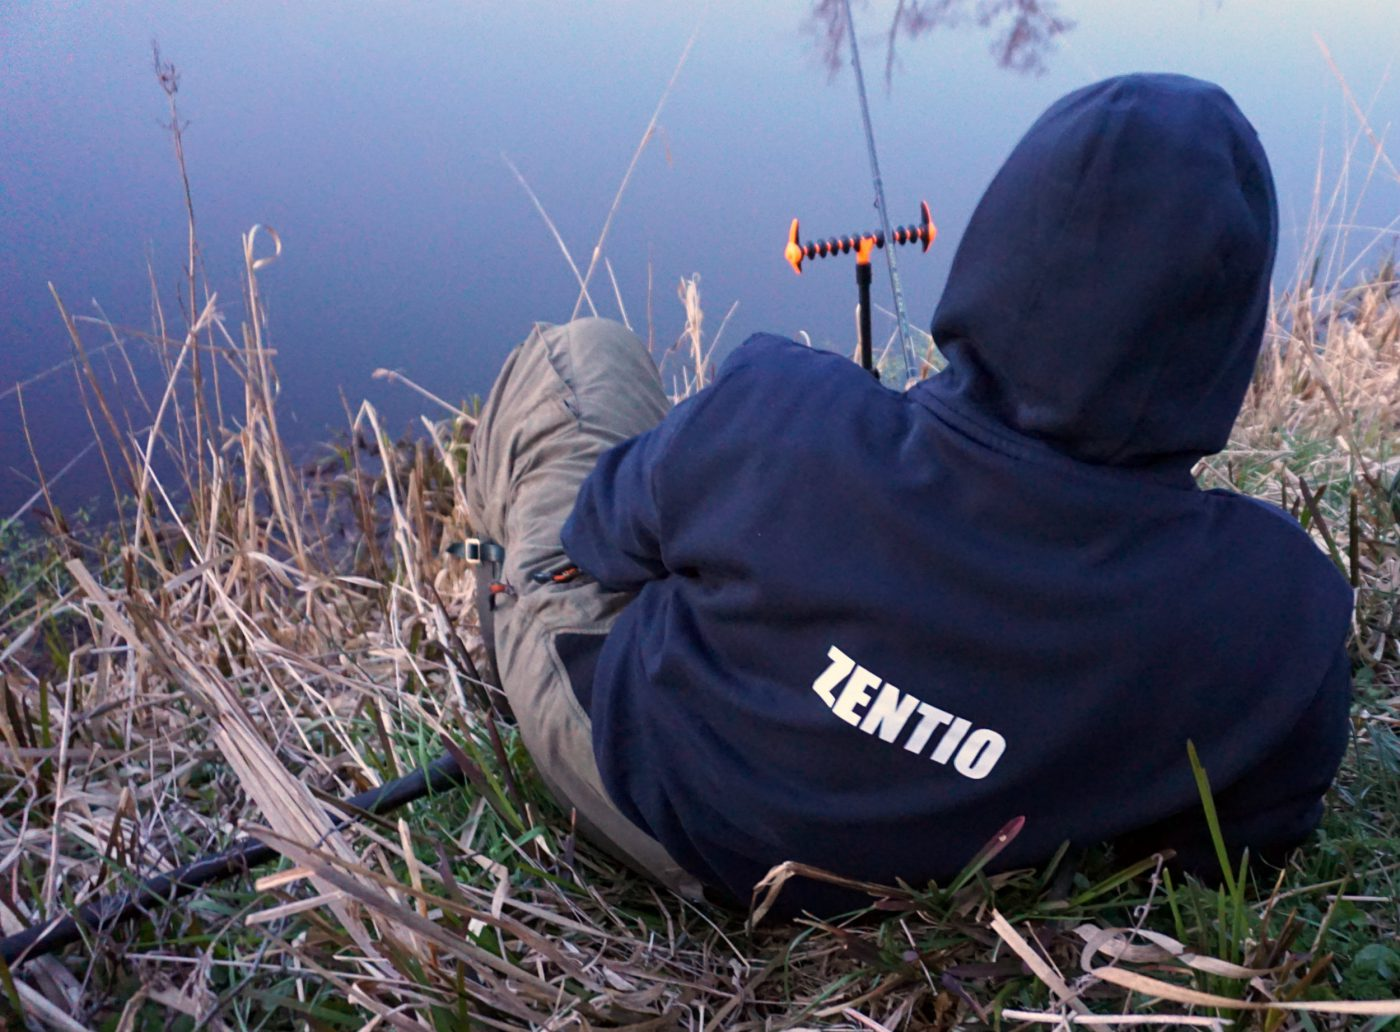 Michael Zentio vilar vid ån